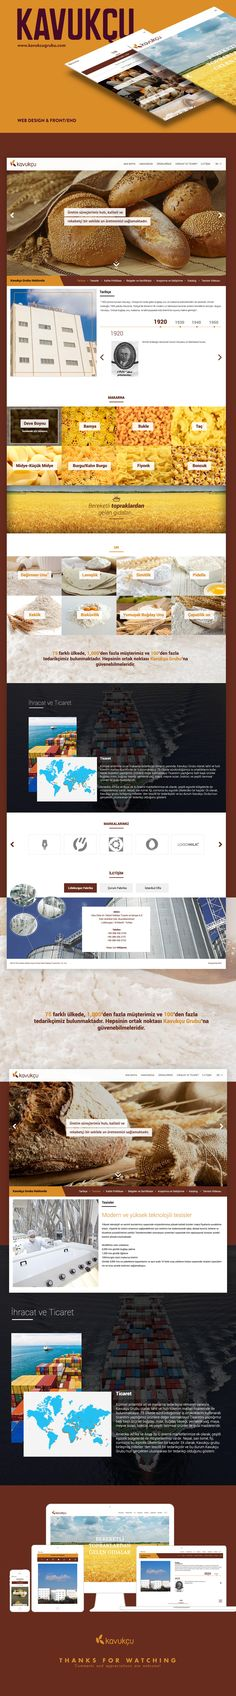 KAVUKCU Web Design , Front&endOnepage, responsiveAgency: OrBiT